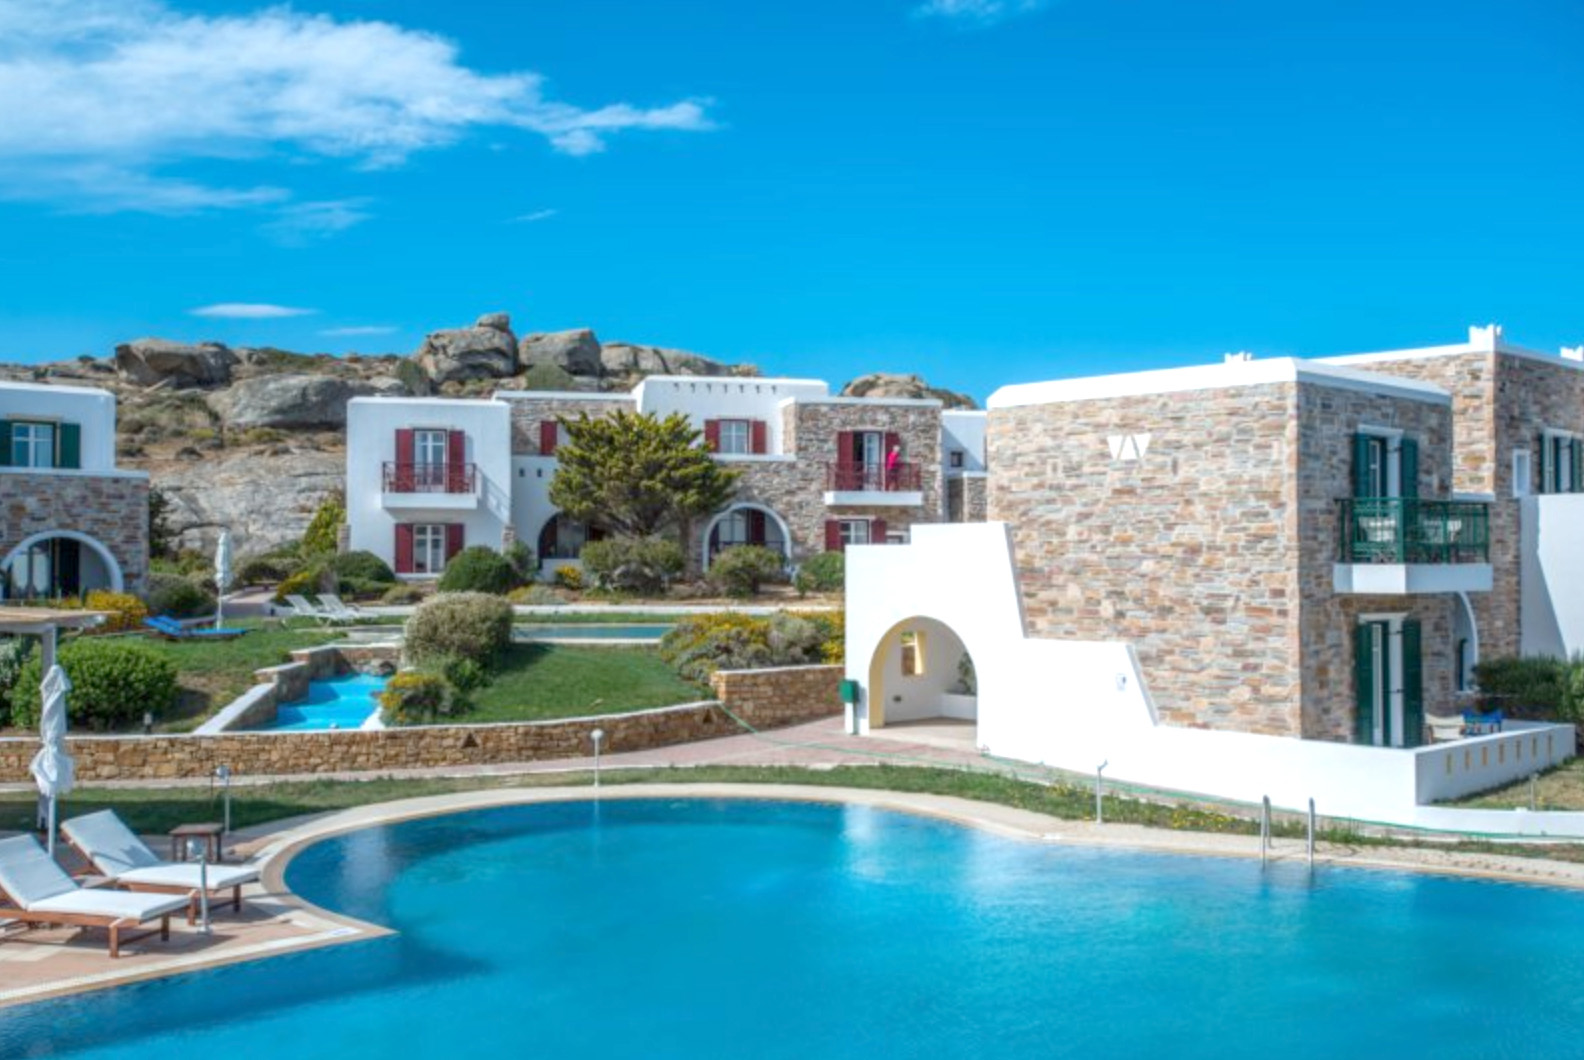 Palace Hotel, Naxos